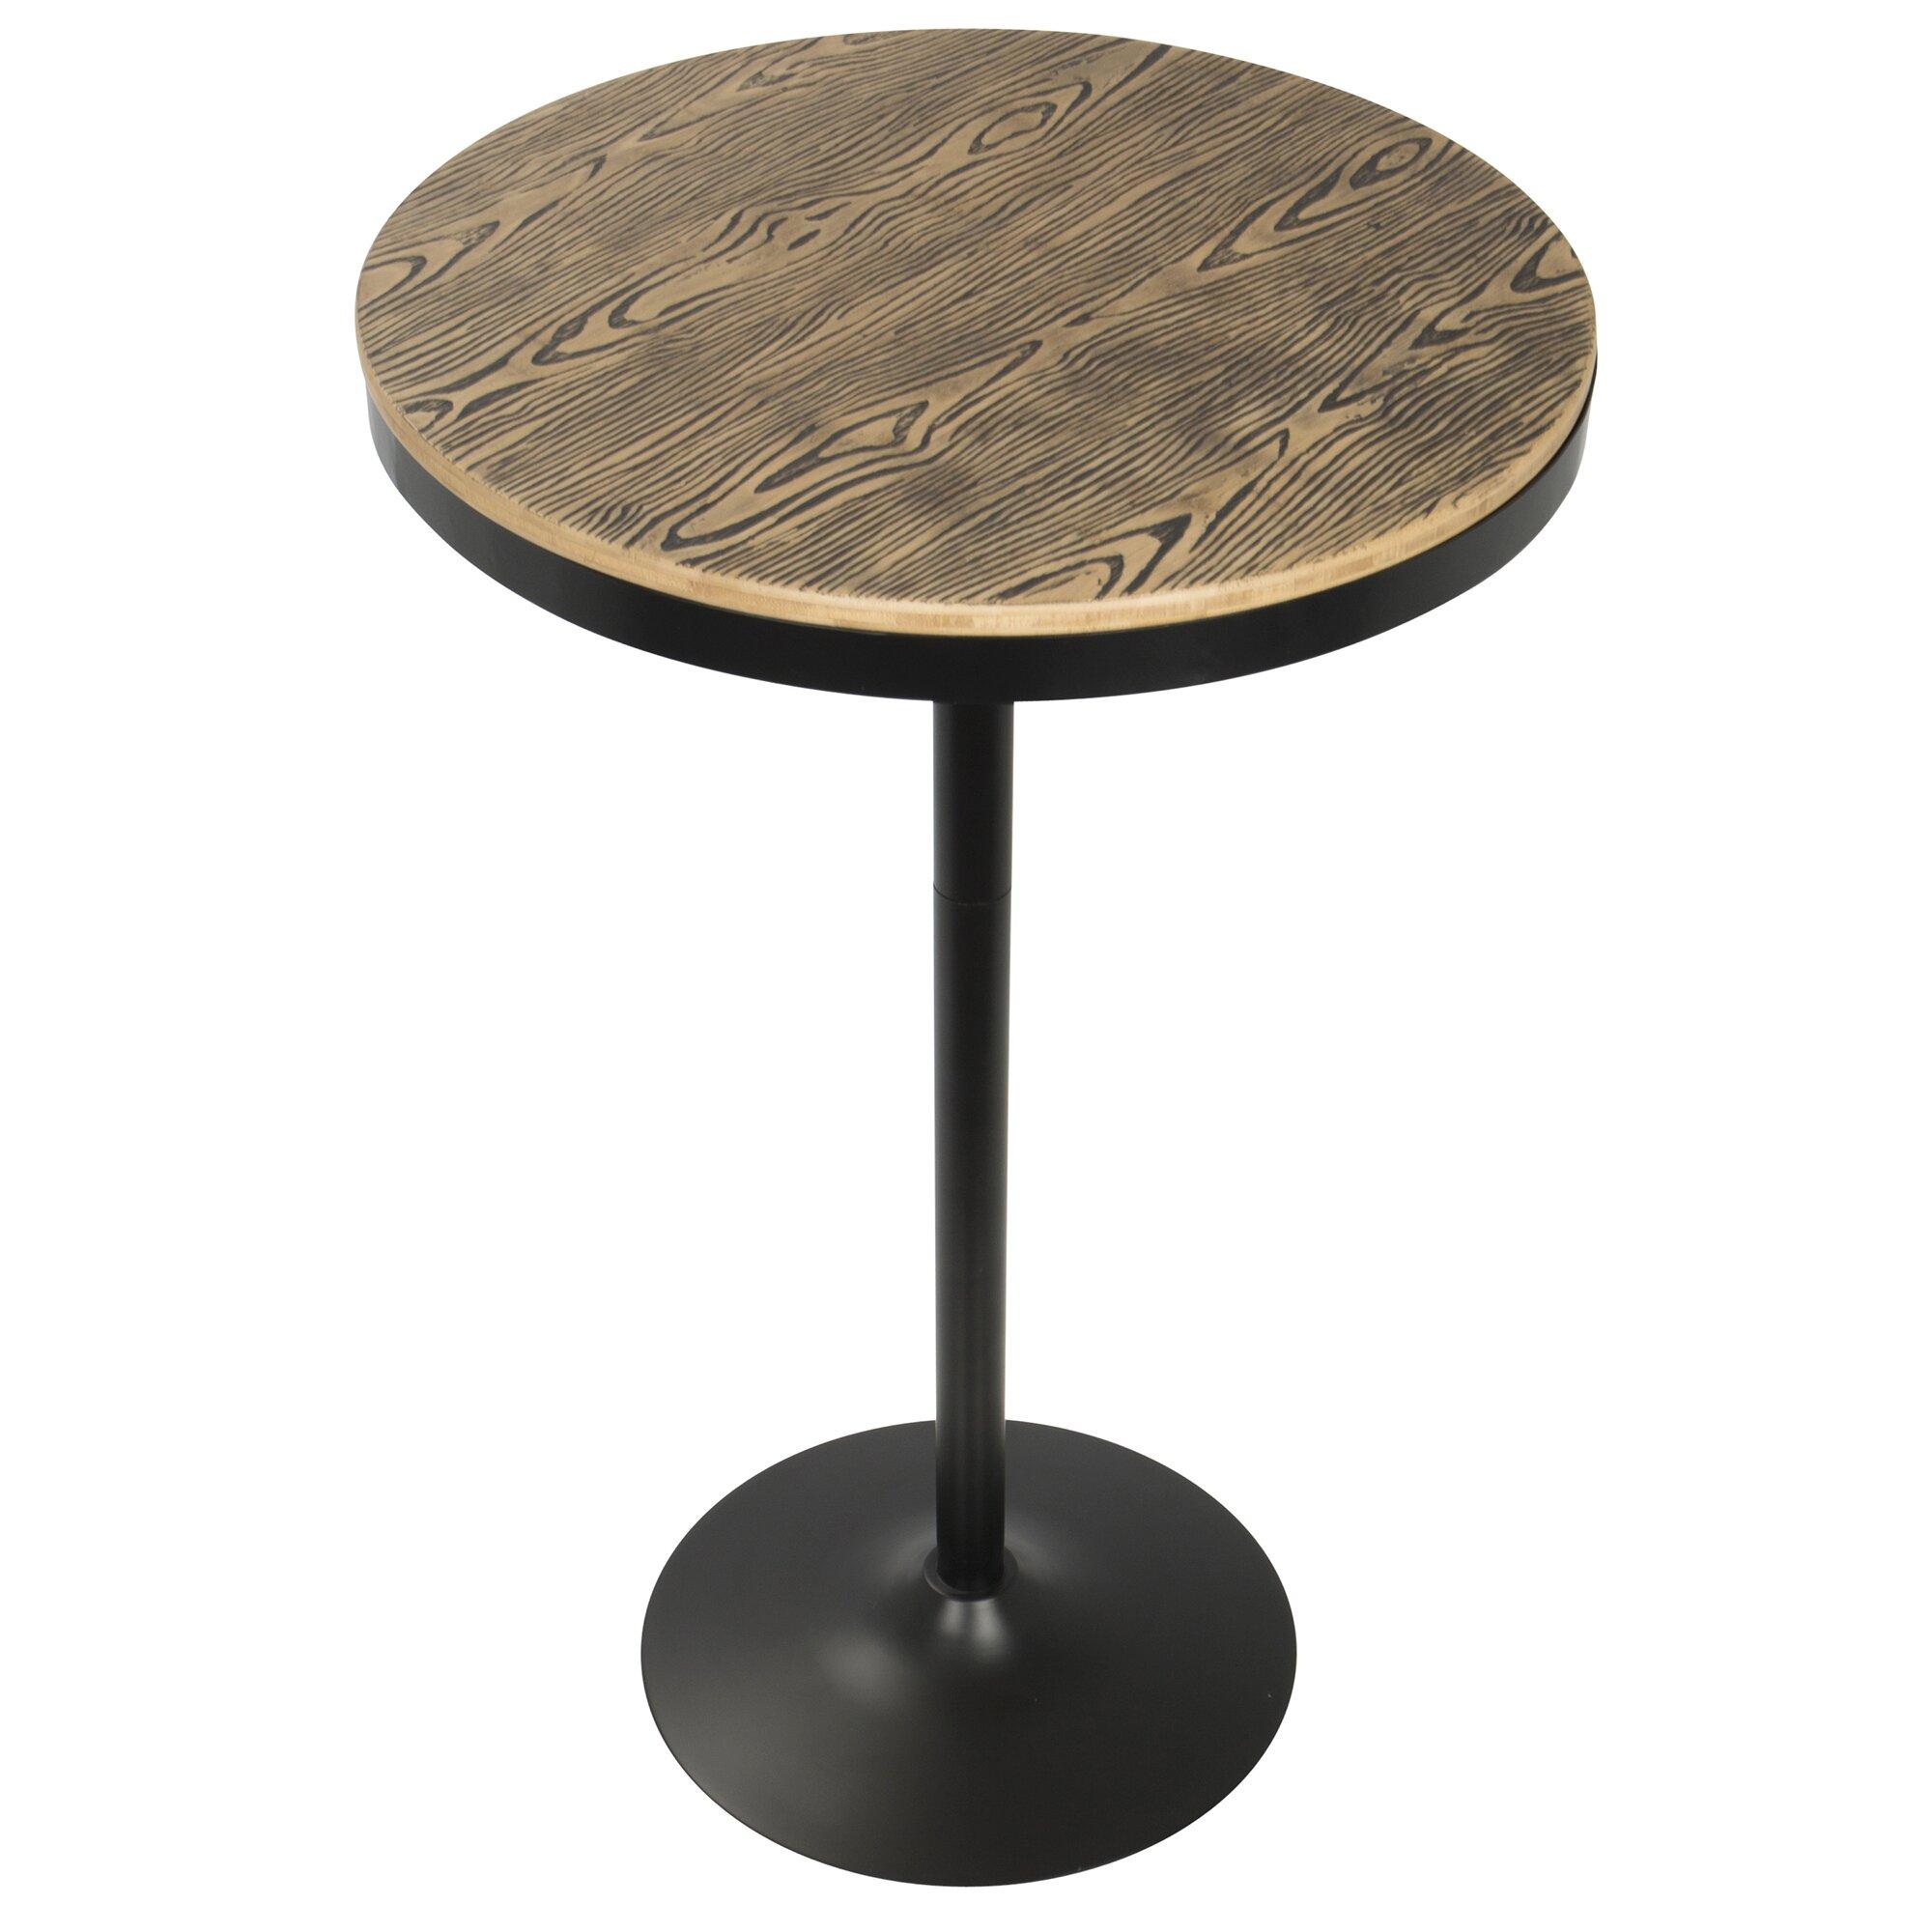 latitude run baer  piece adjustable pub table set  wayfair supply - baer  piece adjustable pub table set